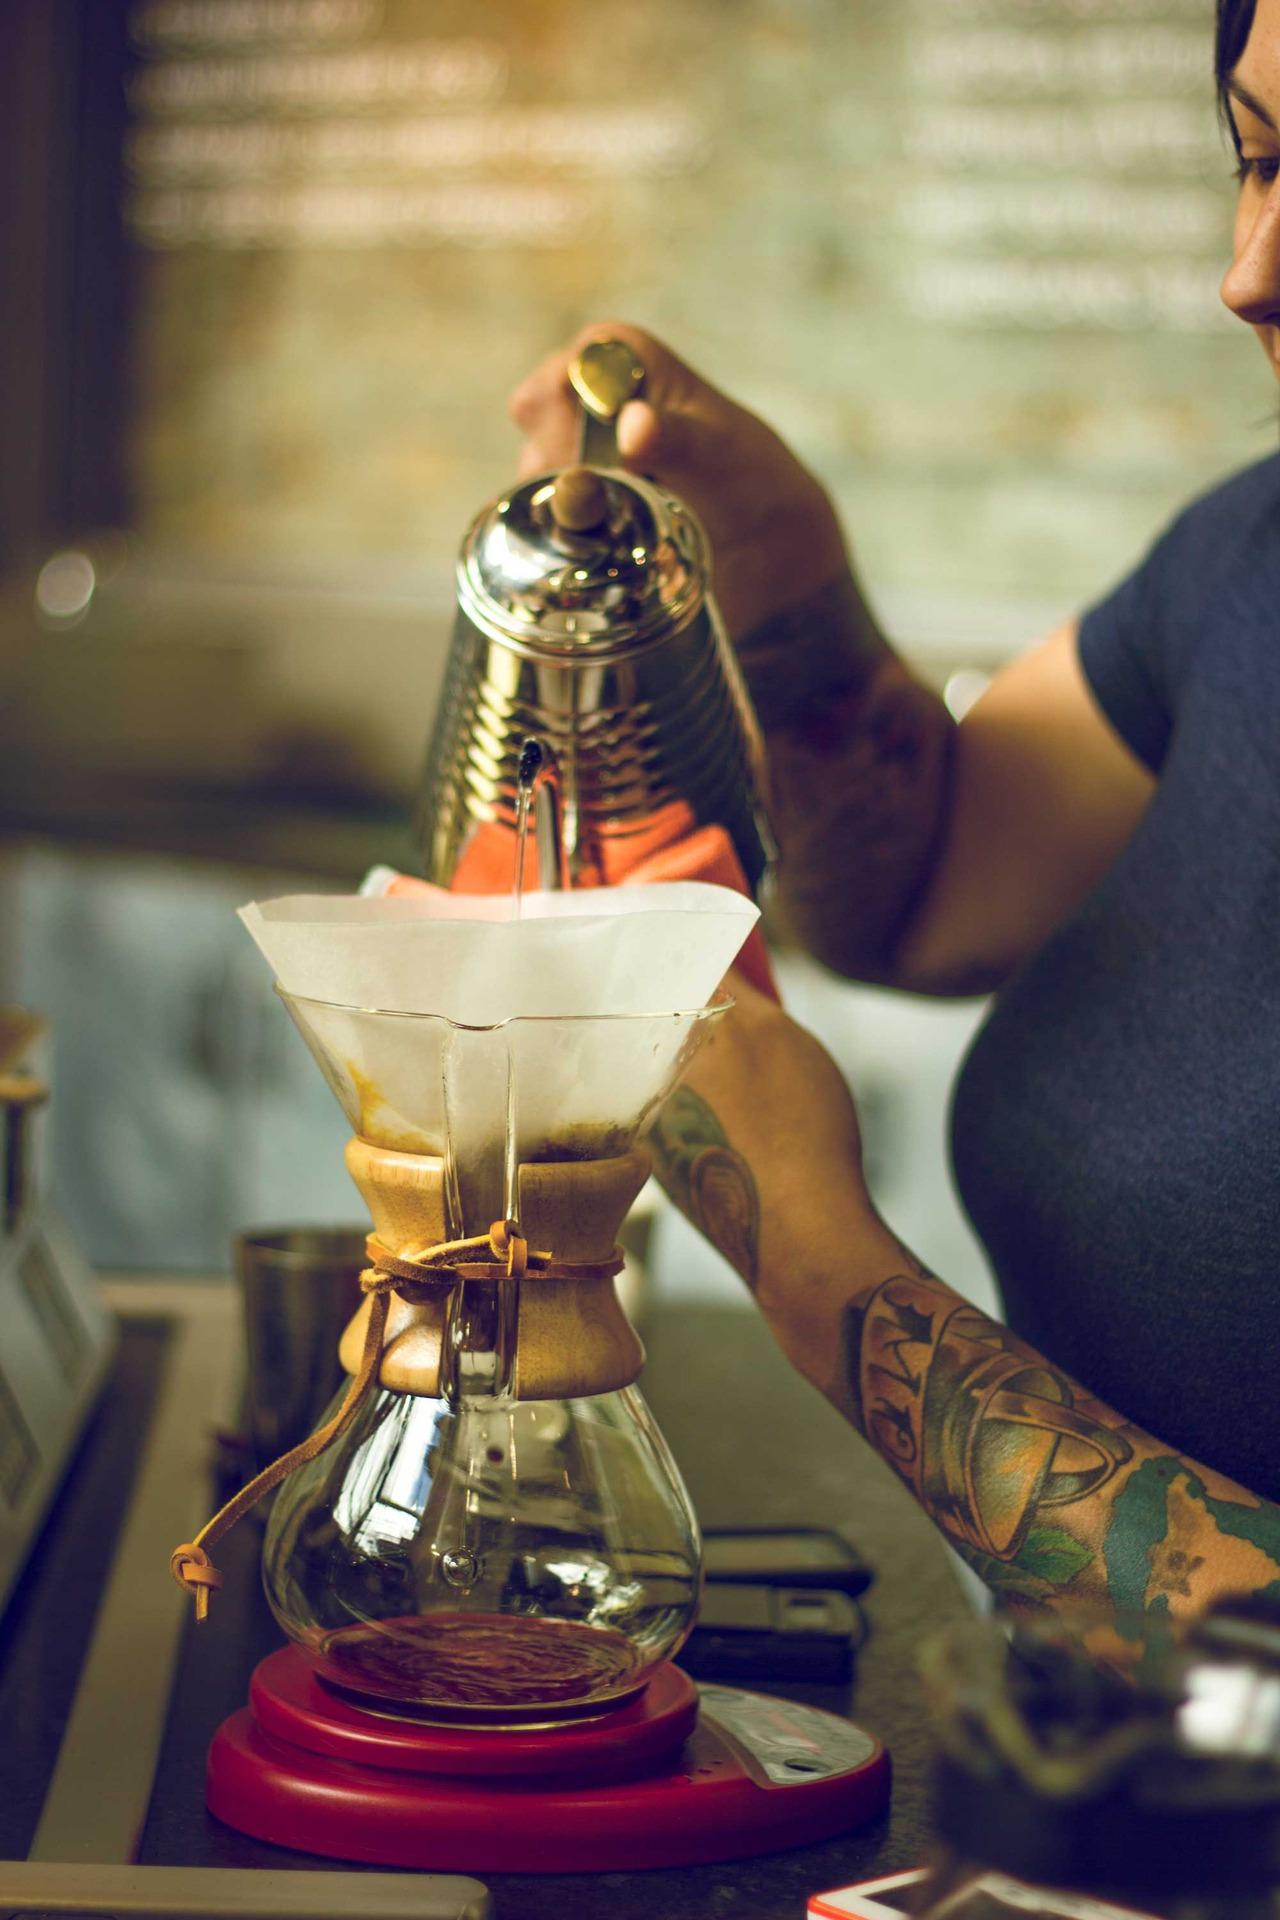 Best coffee in Minneapolis hands down. Gotta love the chemex!